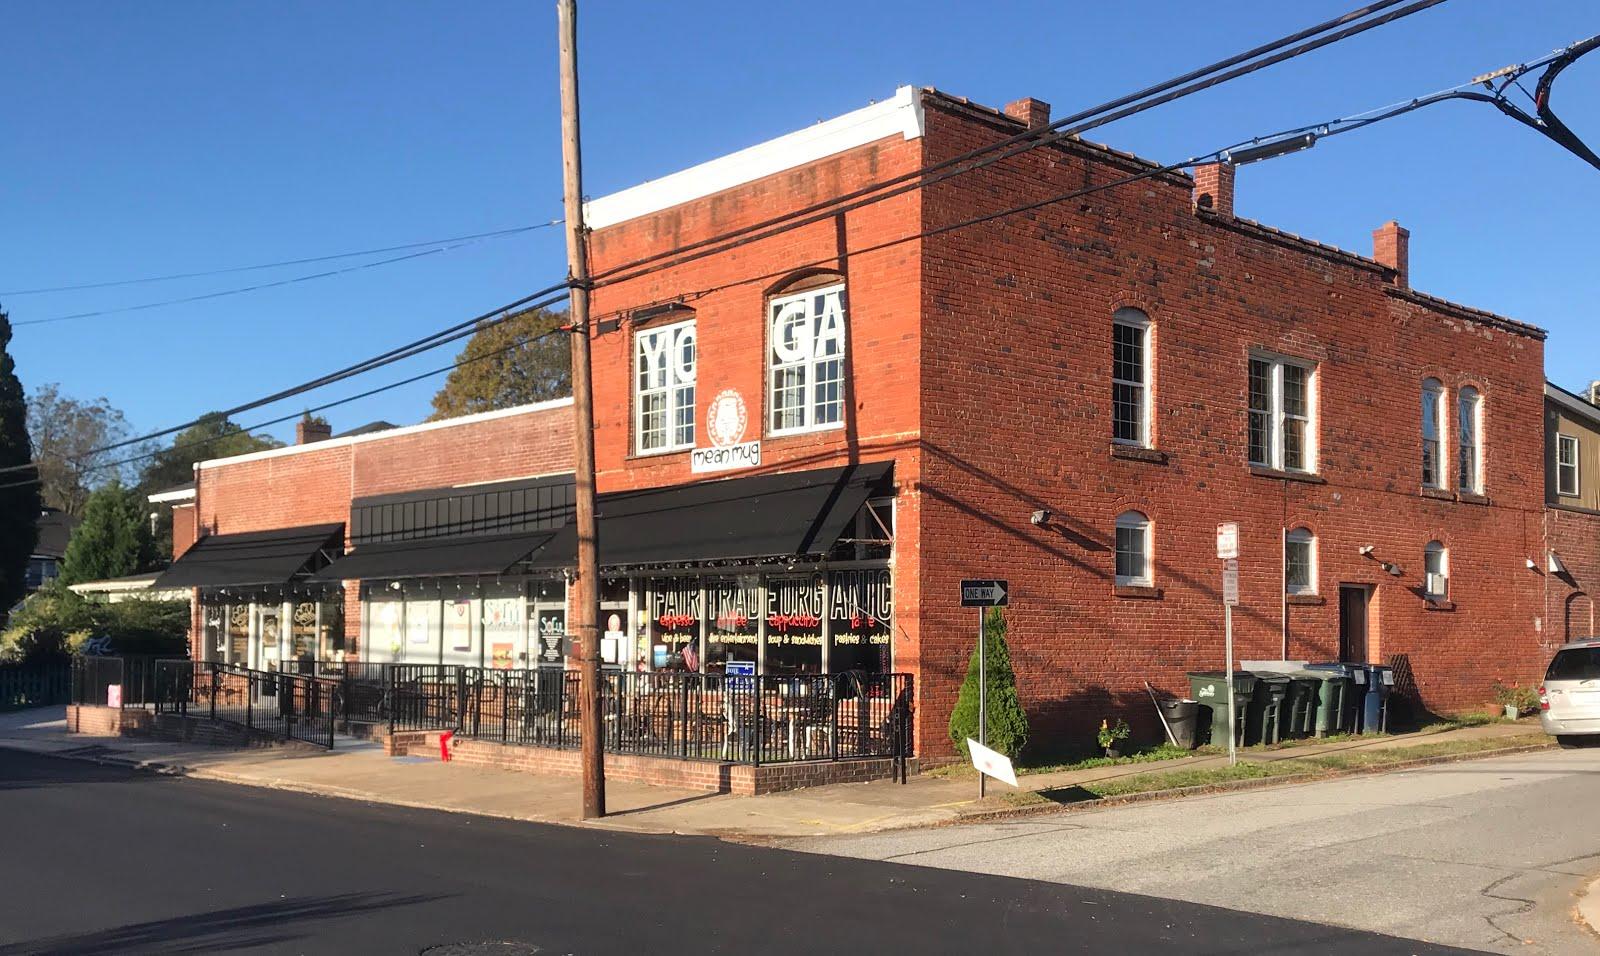 1024-1026 South Fulton Street, Salisbury NC 28144 ~ circa 1918 ~ $750,000